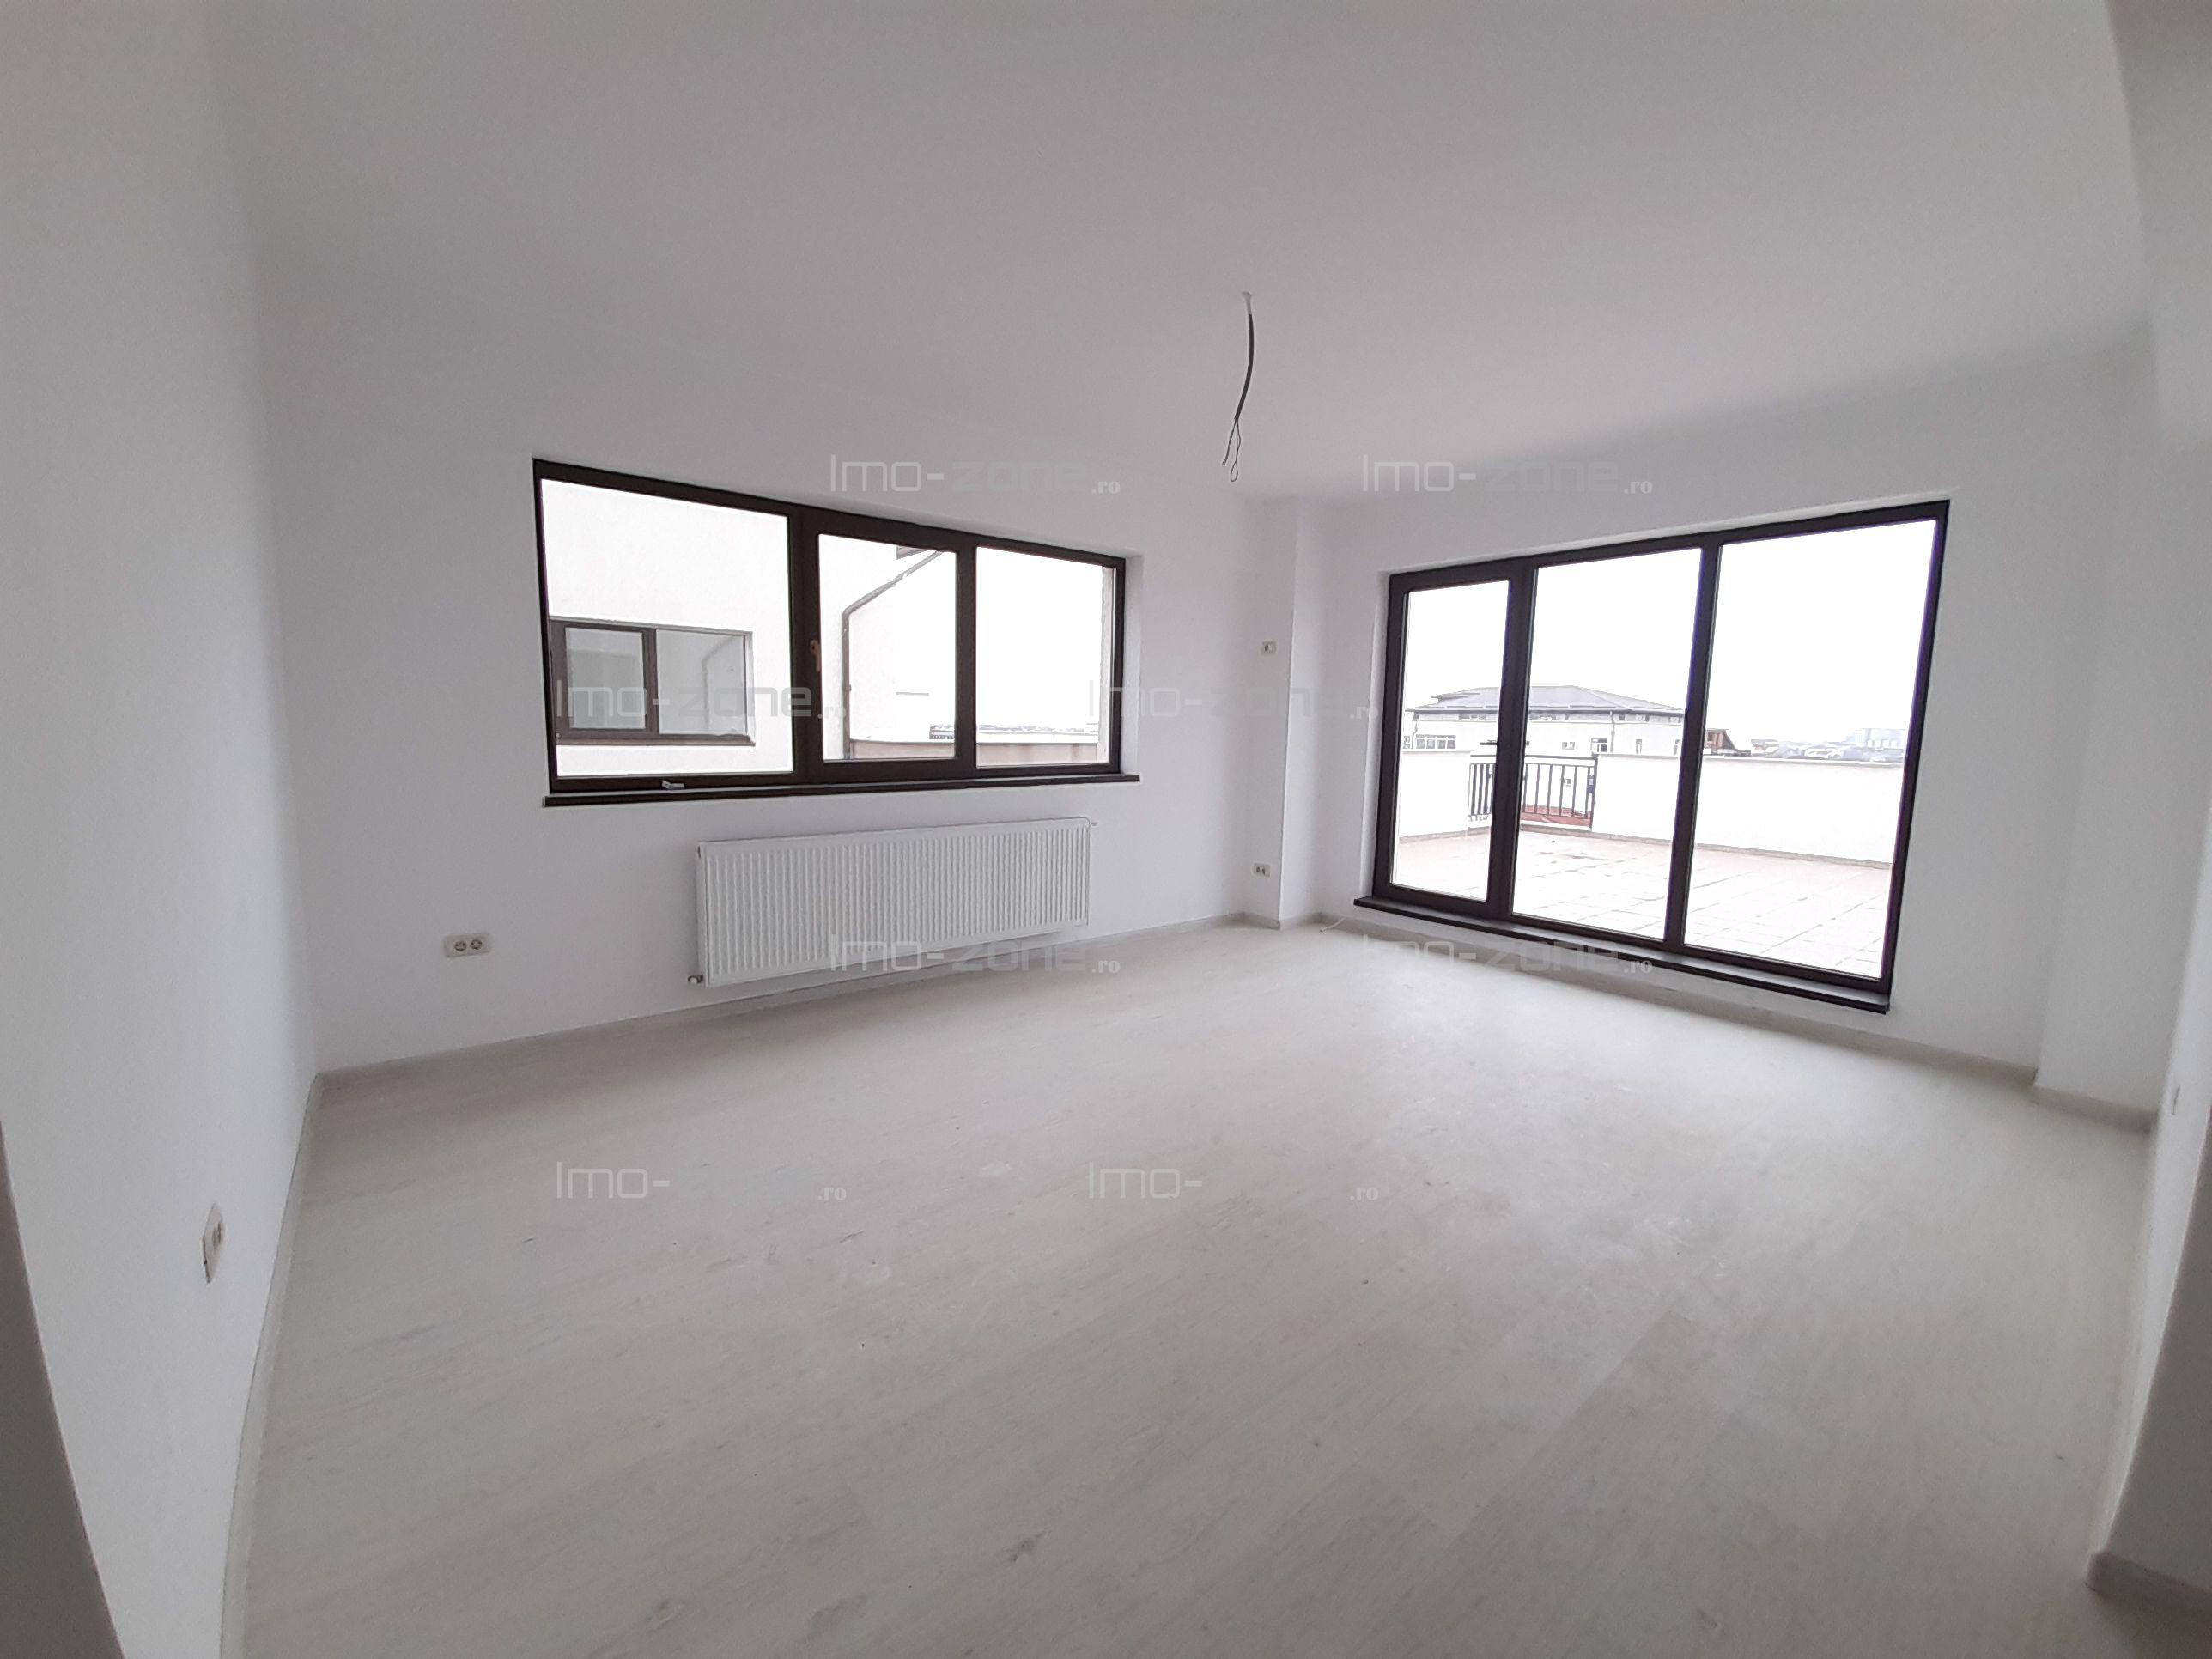 Apartament 3 camere + terasa, Drumul Taberei, Funigeilor, finalizat, comision 0%